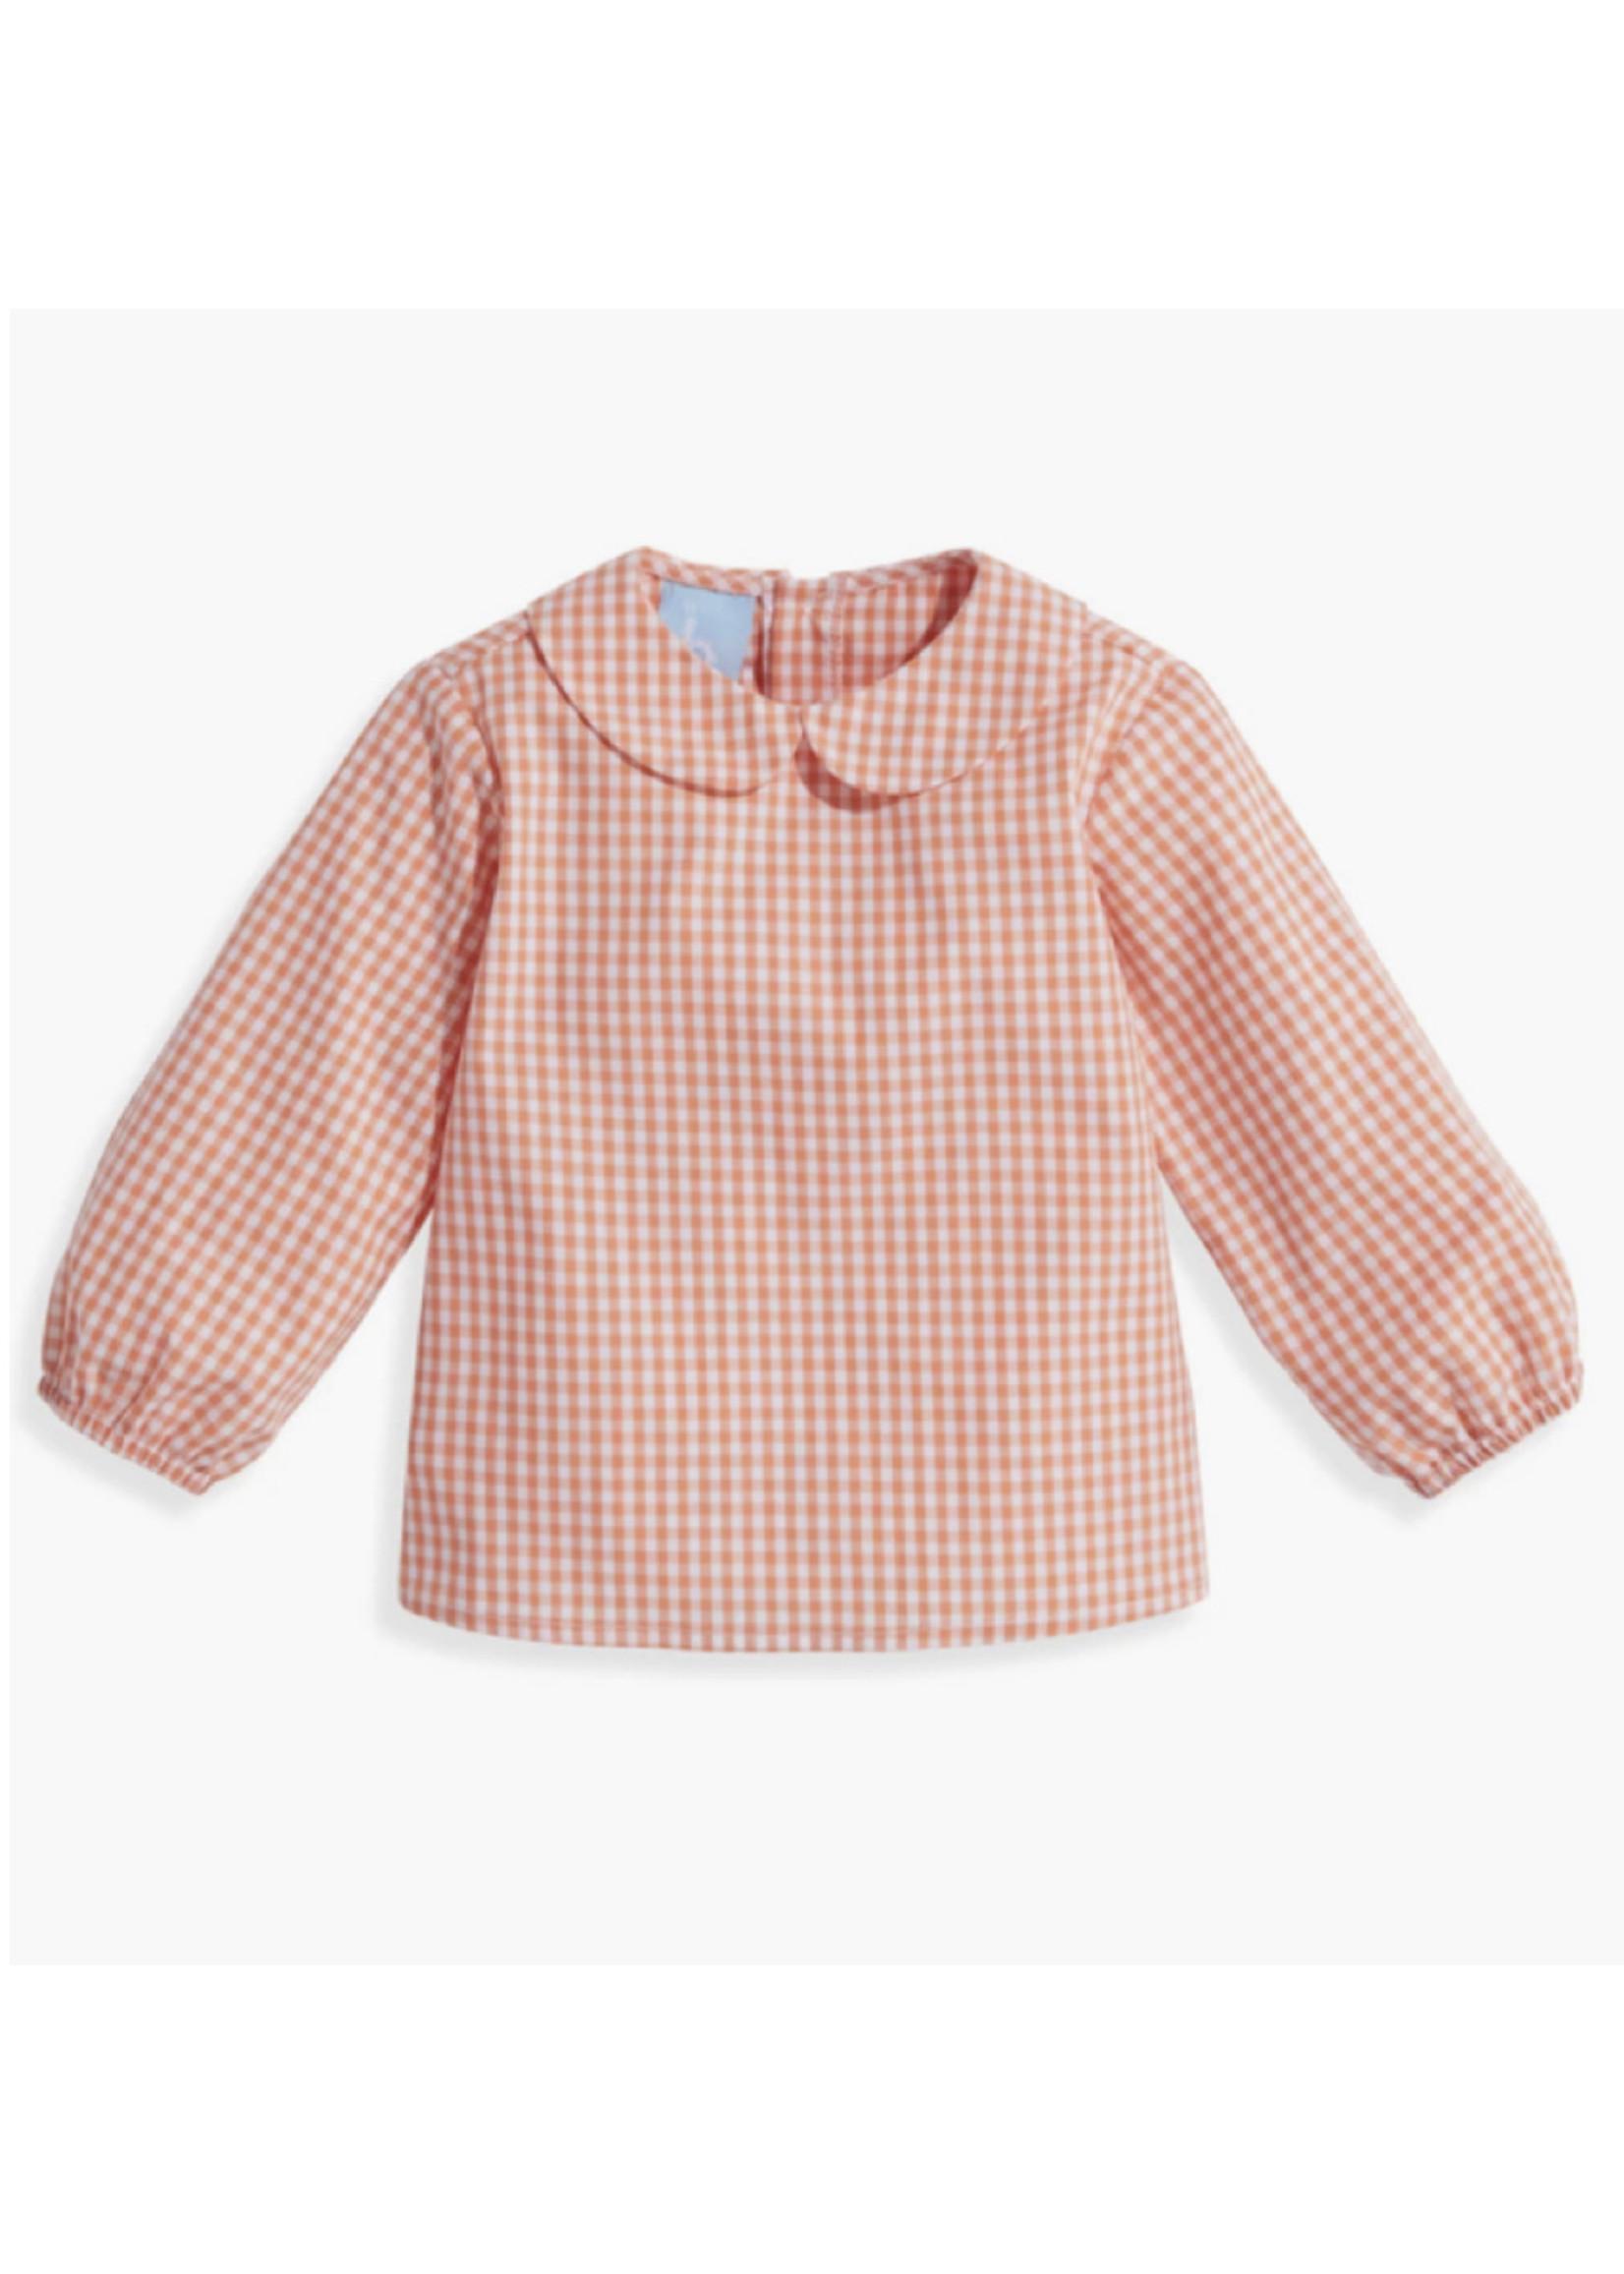 Bella Bliss Thomas Shirt